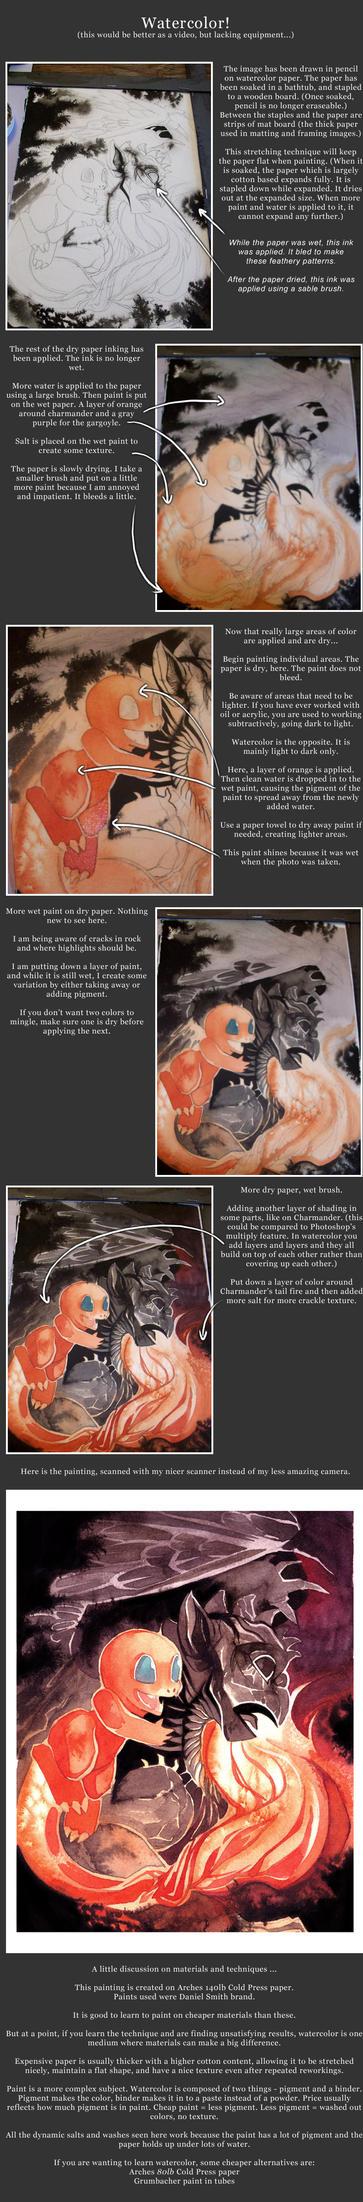 Watercolor Tutorial Part 1 by blix-it